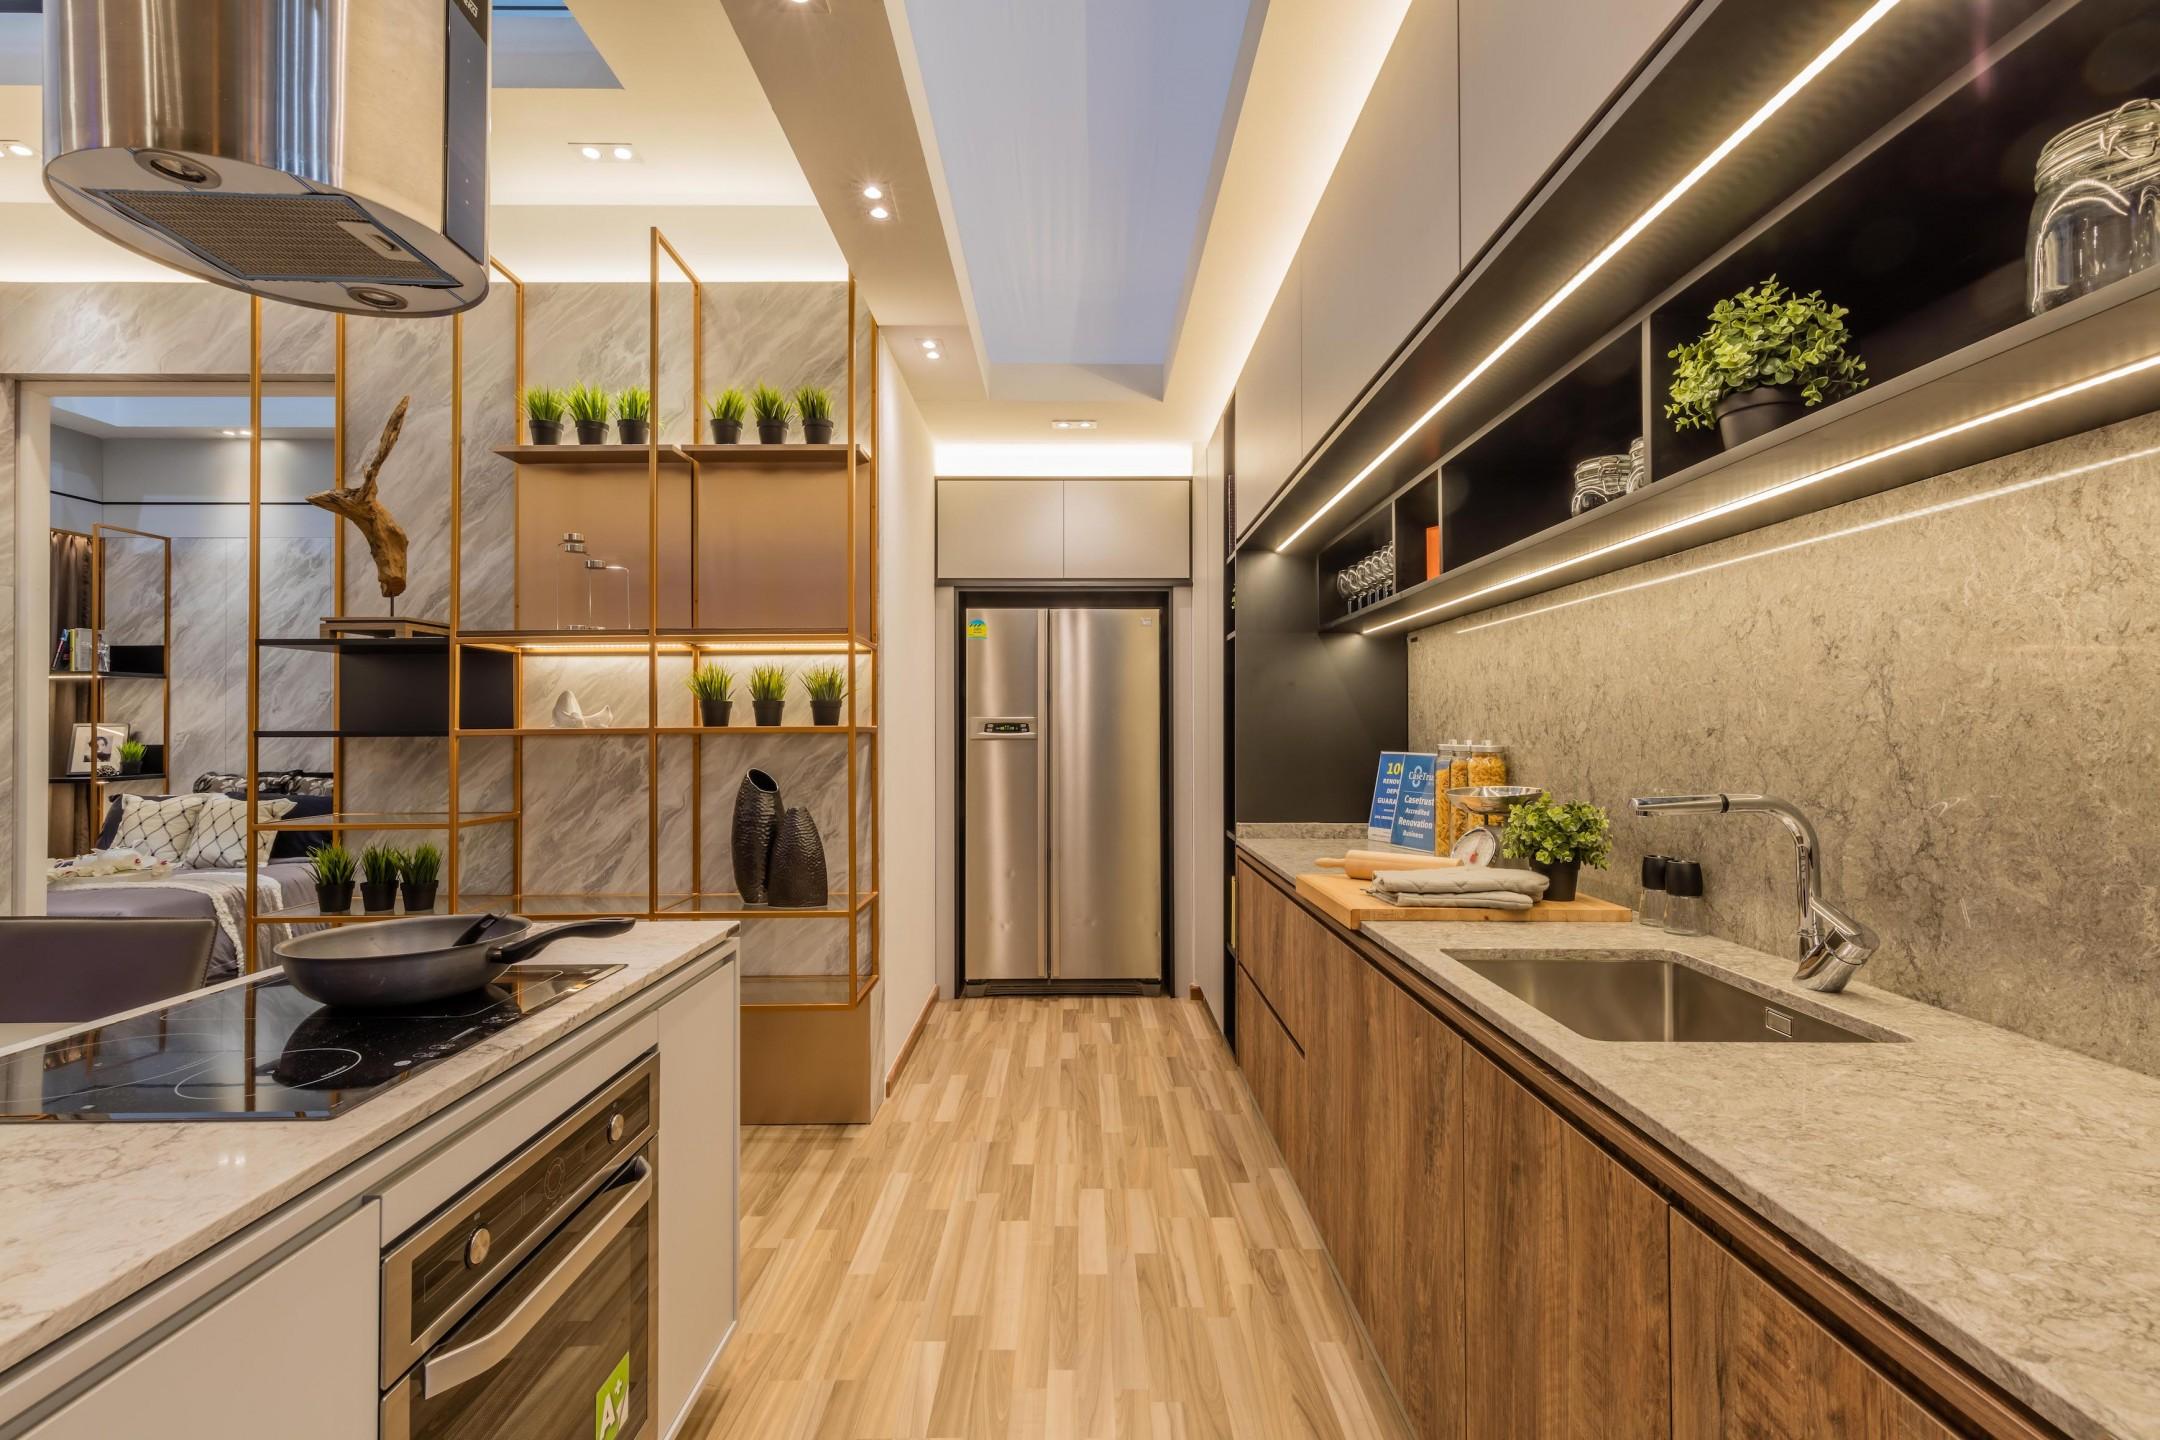 squarerooms-caesarstone-wooden-contemporary-kitchen-sleek